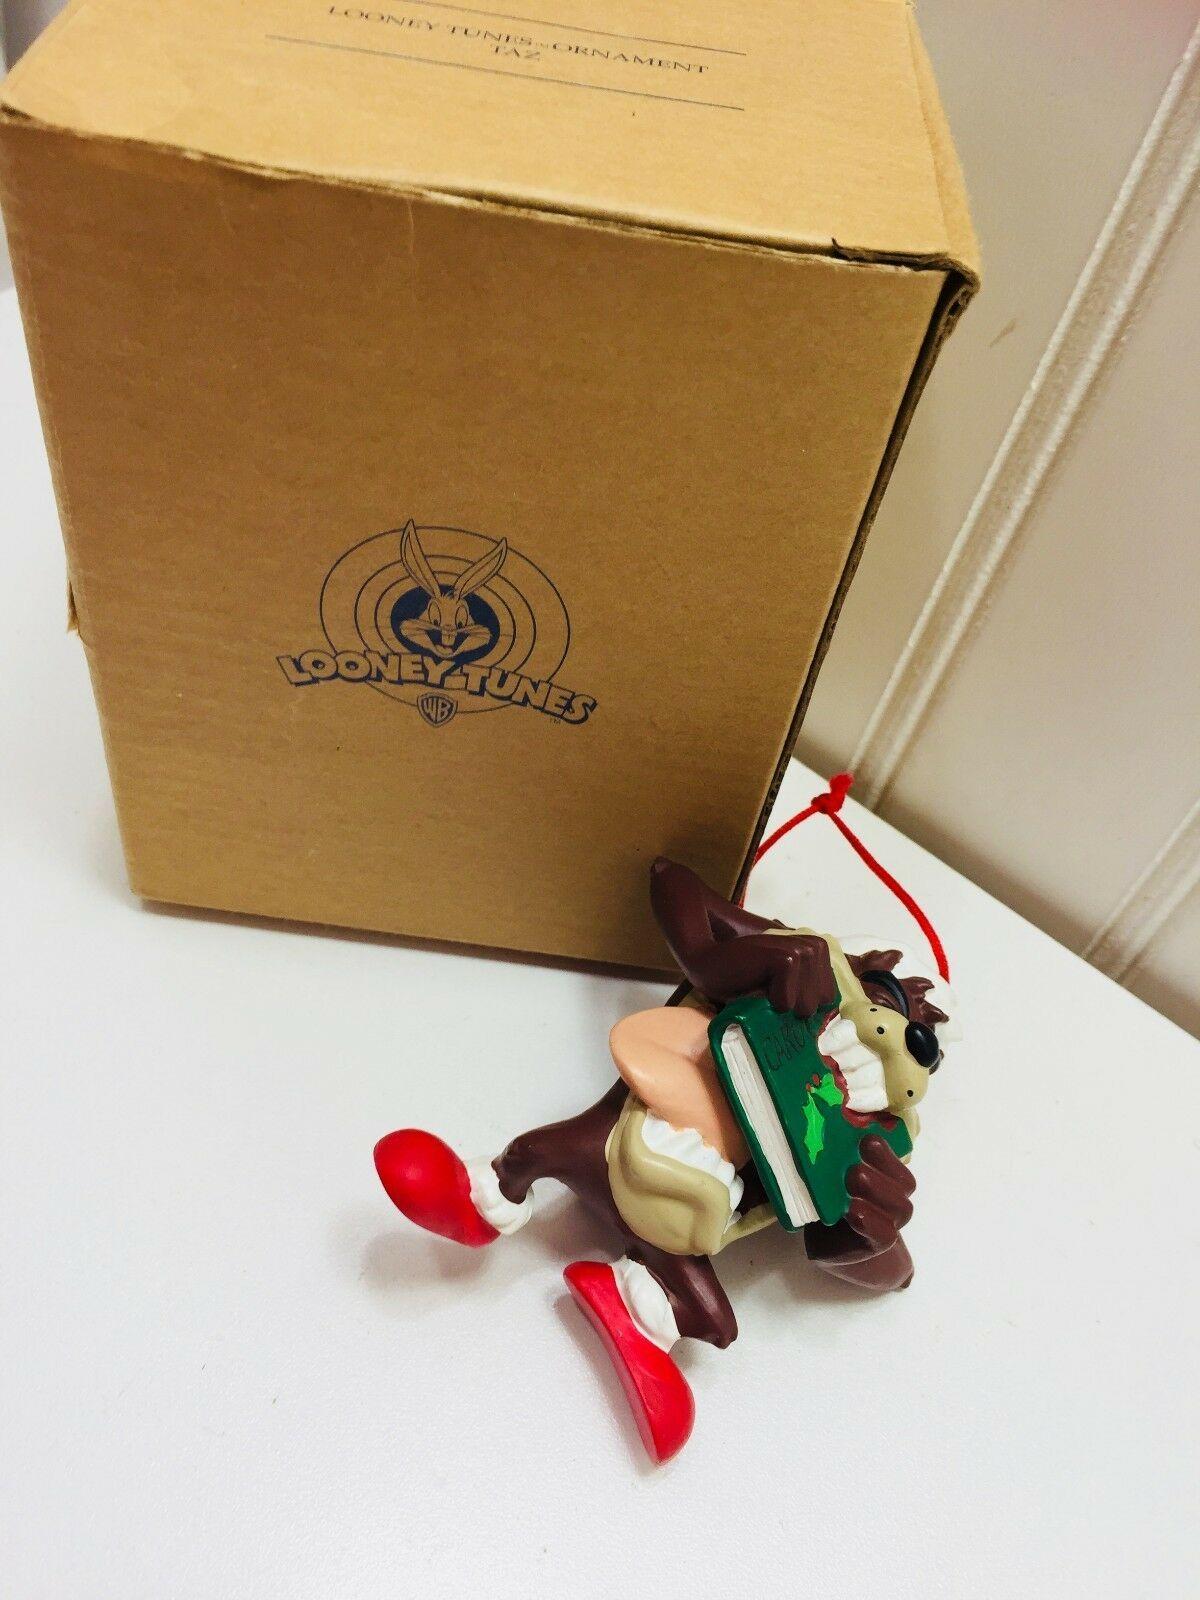 Avon Christmas Ornament Taz Eating Carols Looney Tunes 1998 Vintage 22717